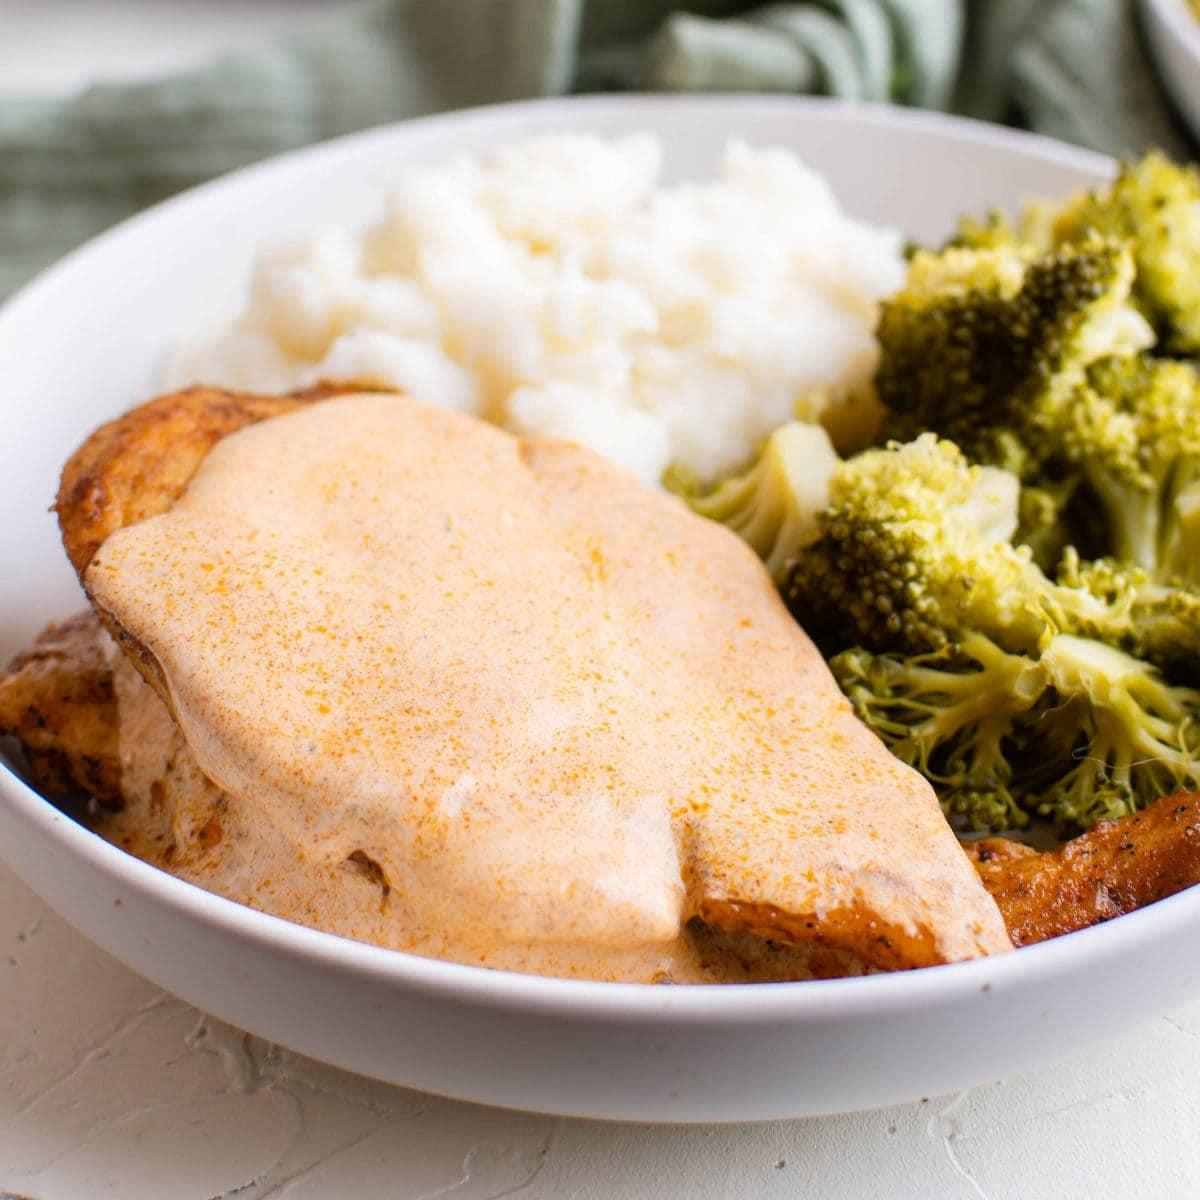 chicken breasts, mustard sauce, broccoli, mashed potatoed